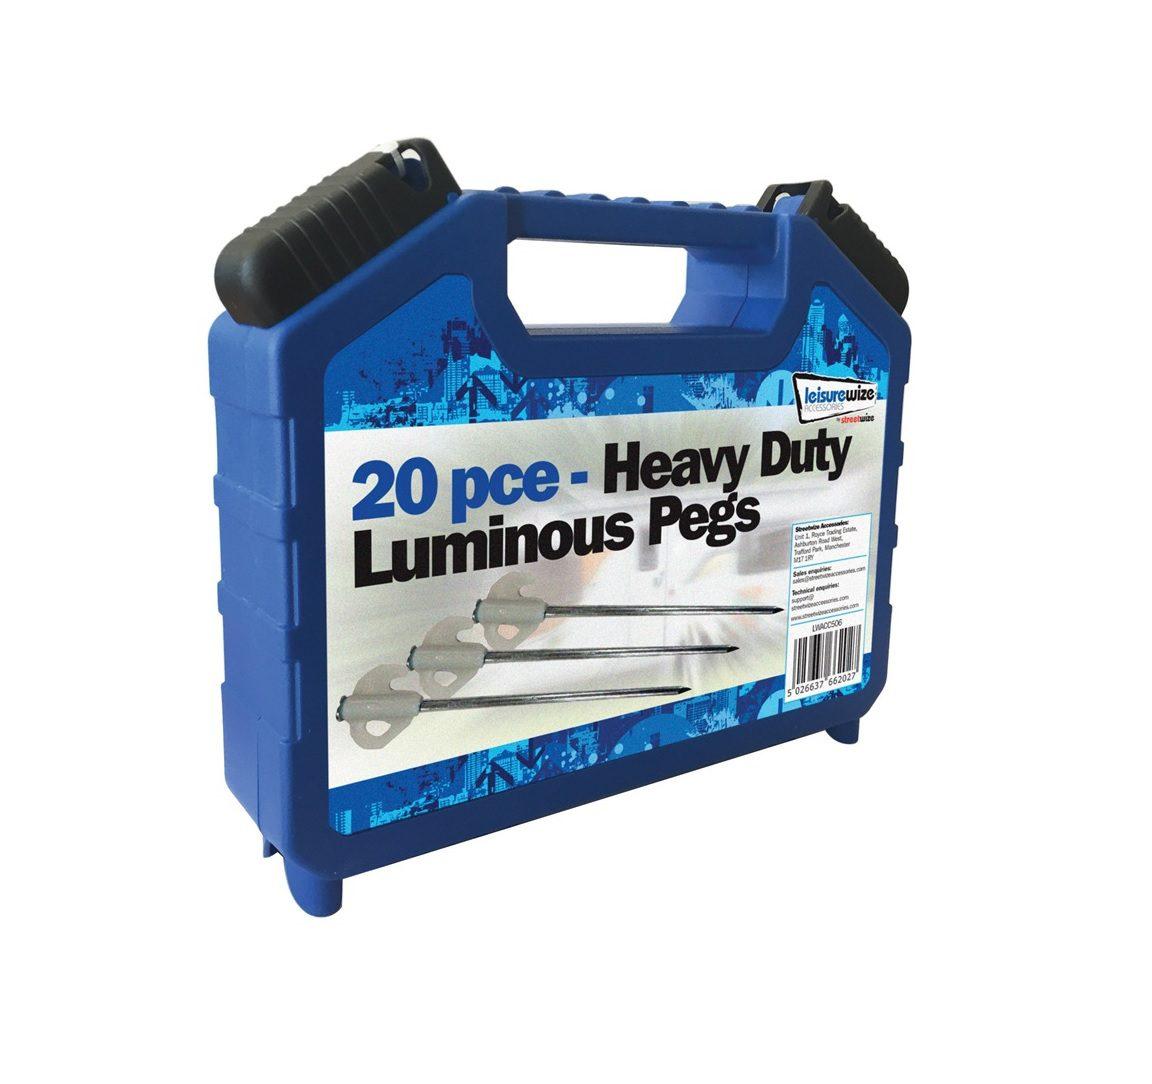 esiurewize 20 Piece Heavy Duty Luminous Pegs